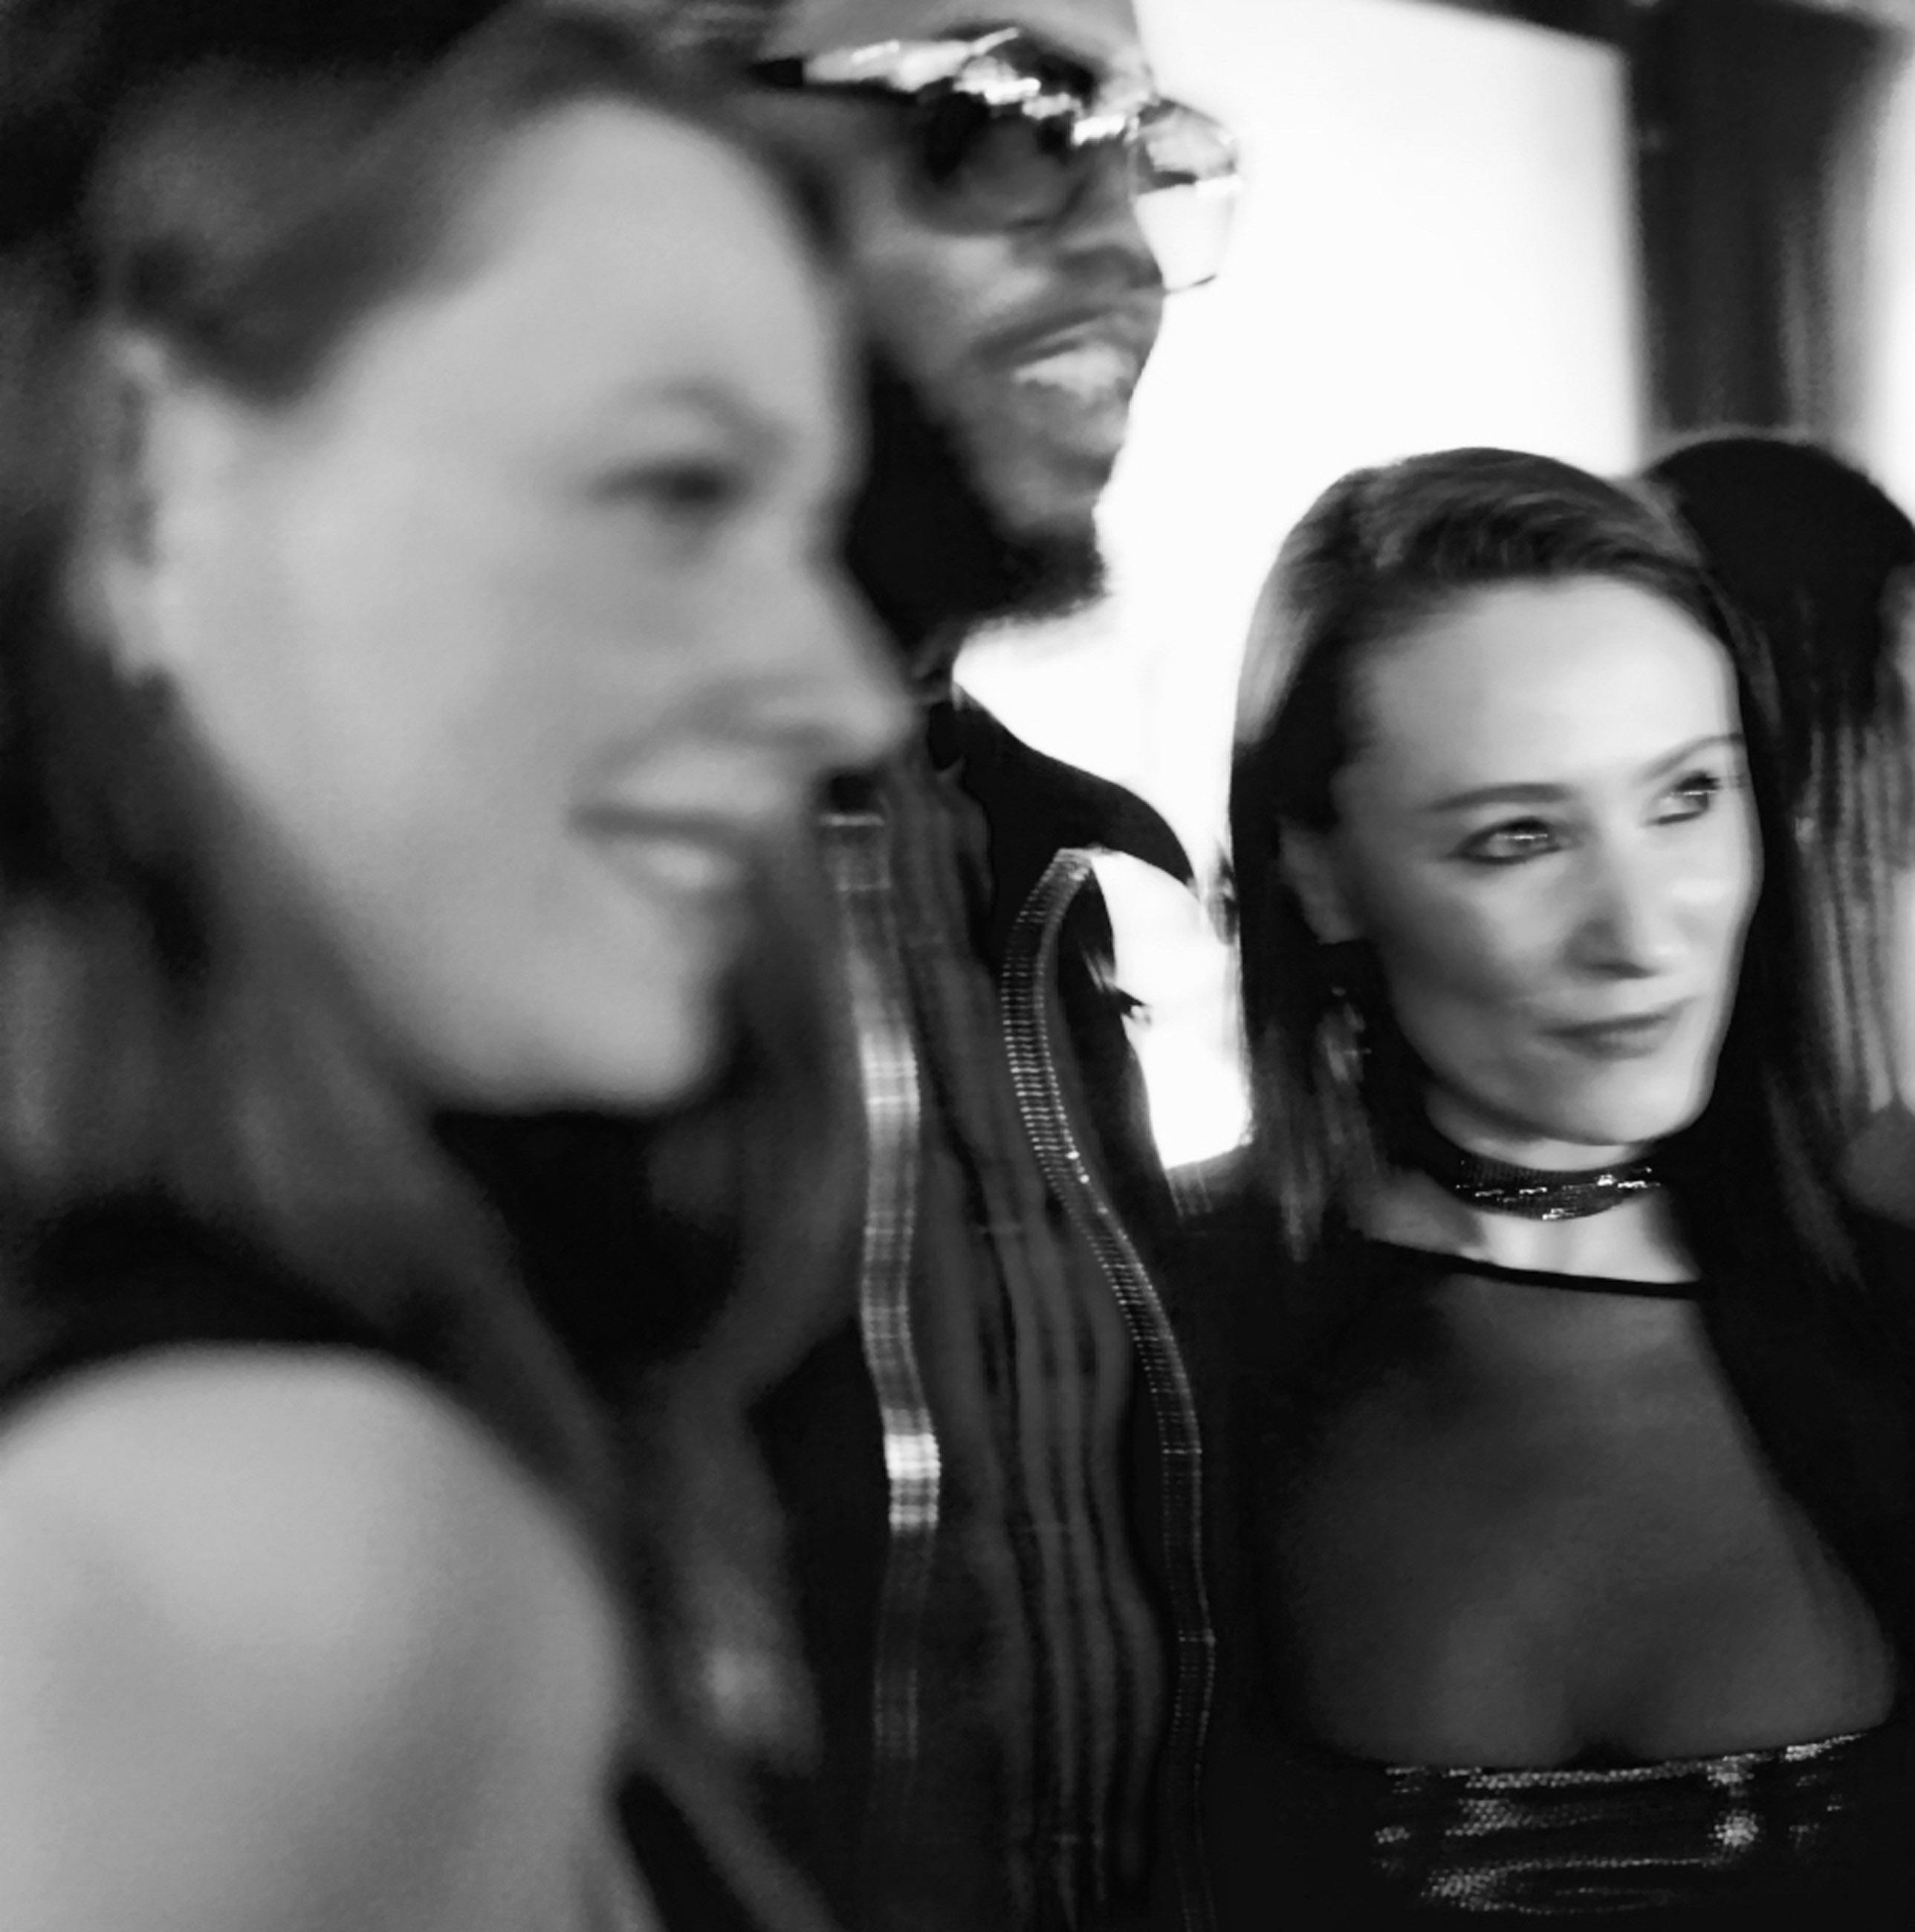 Spirit & Flesh Magazine Jussie Smollett cover event, Vasilisa Deyneko MusicMan-Ty & Yelena Deyneko by Antonio Navas